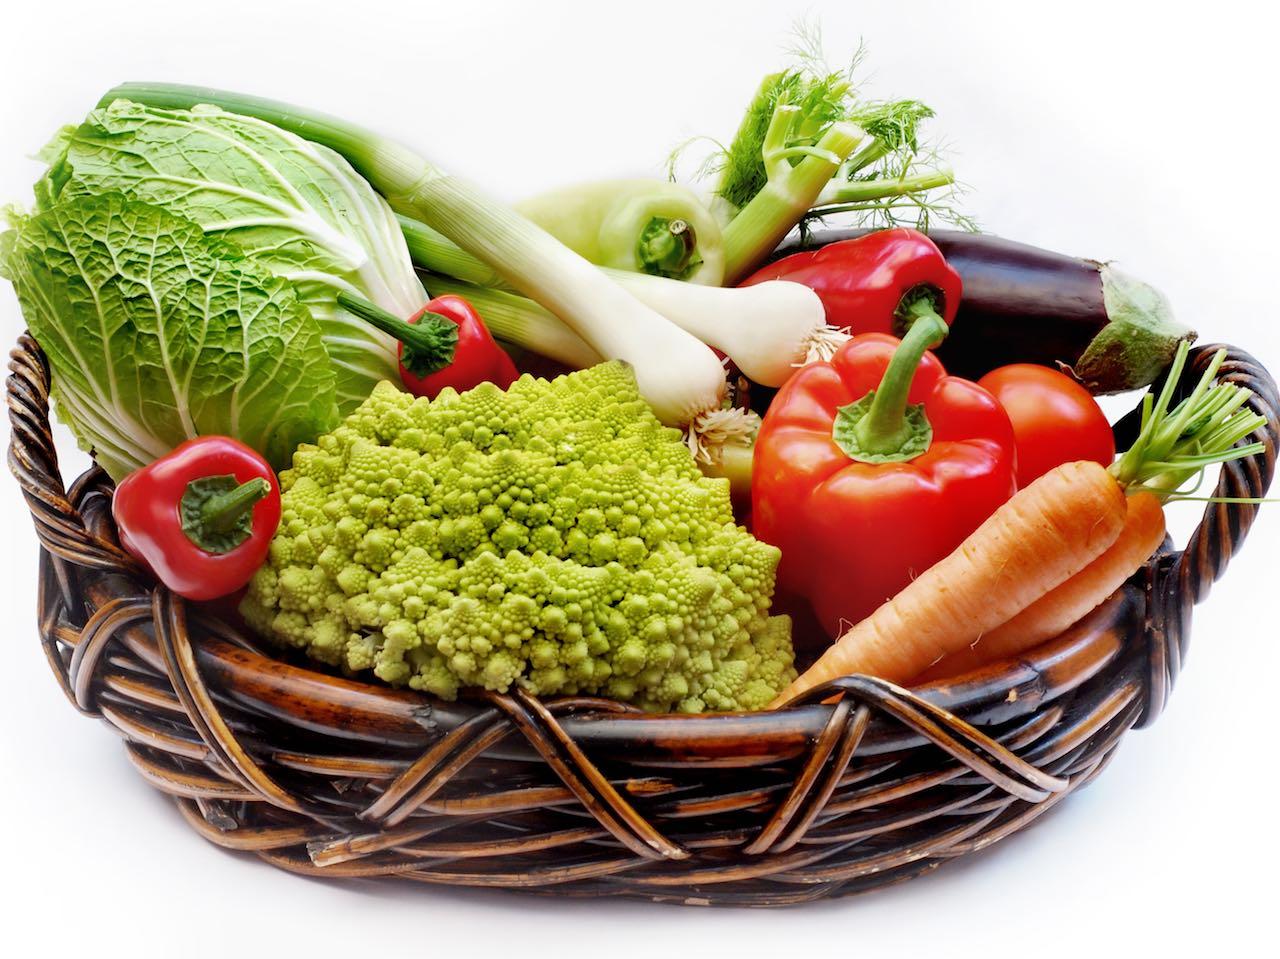 Refrigerator crisper drawer: vegetables in a wicker basket.